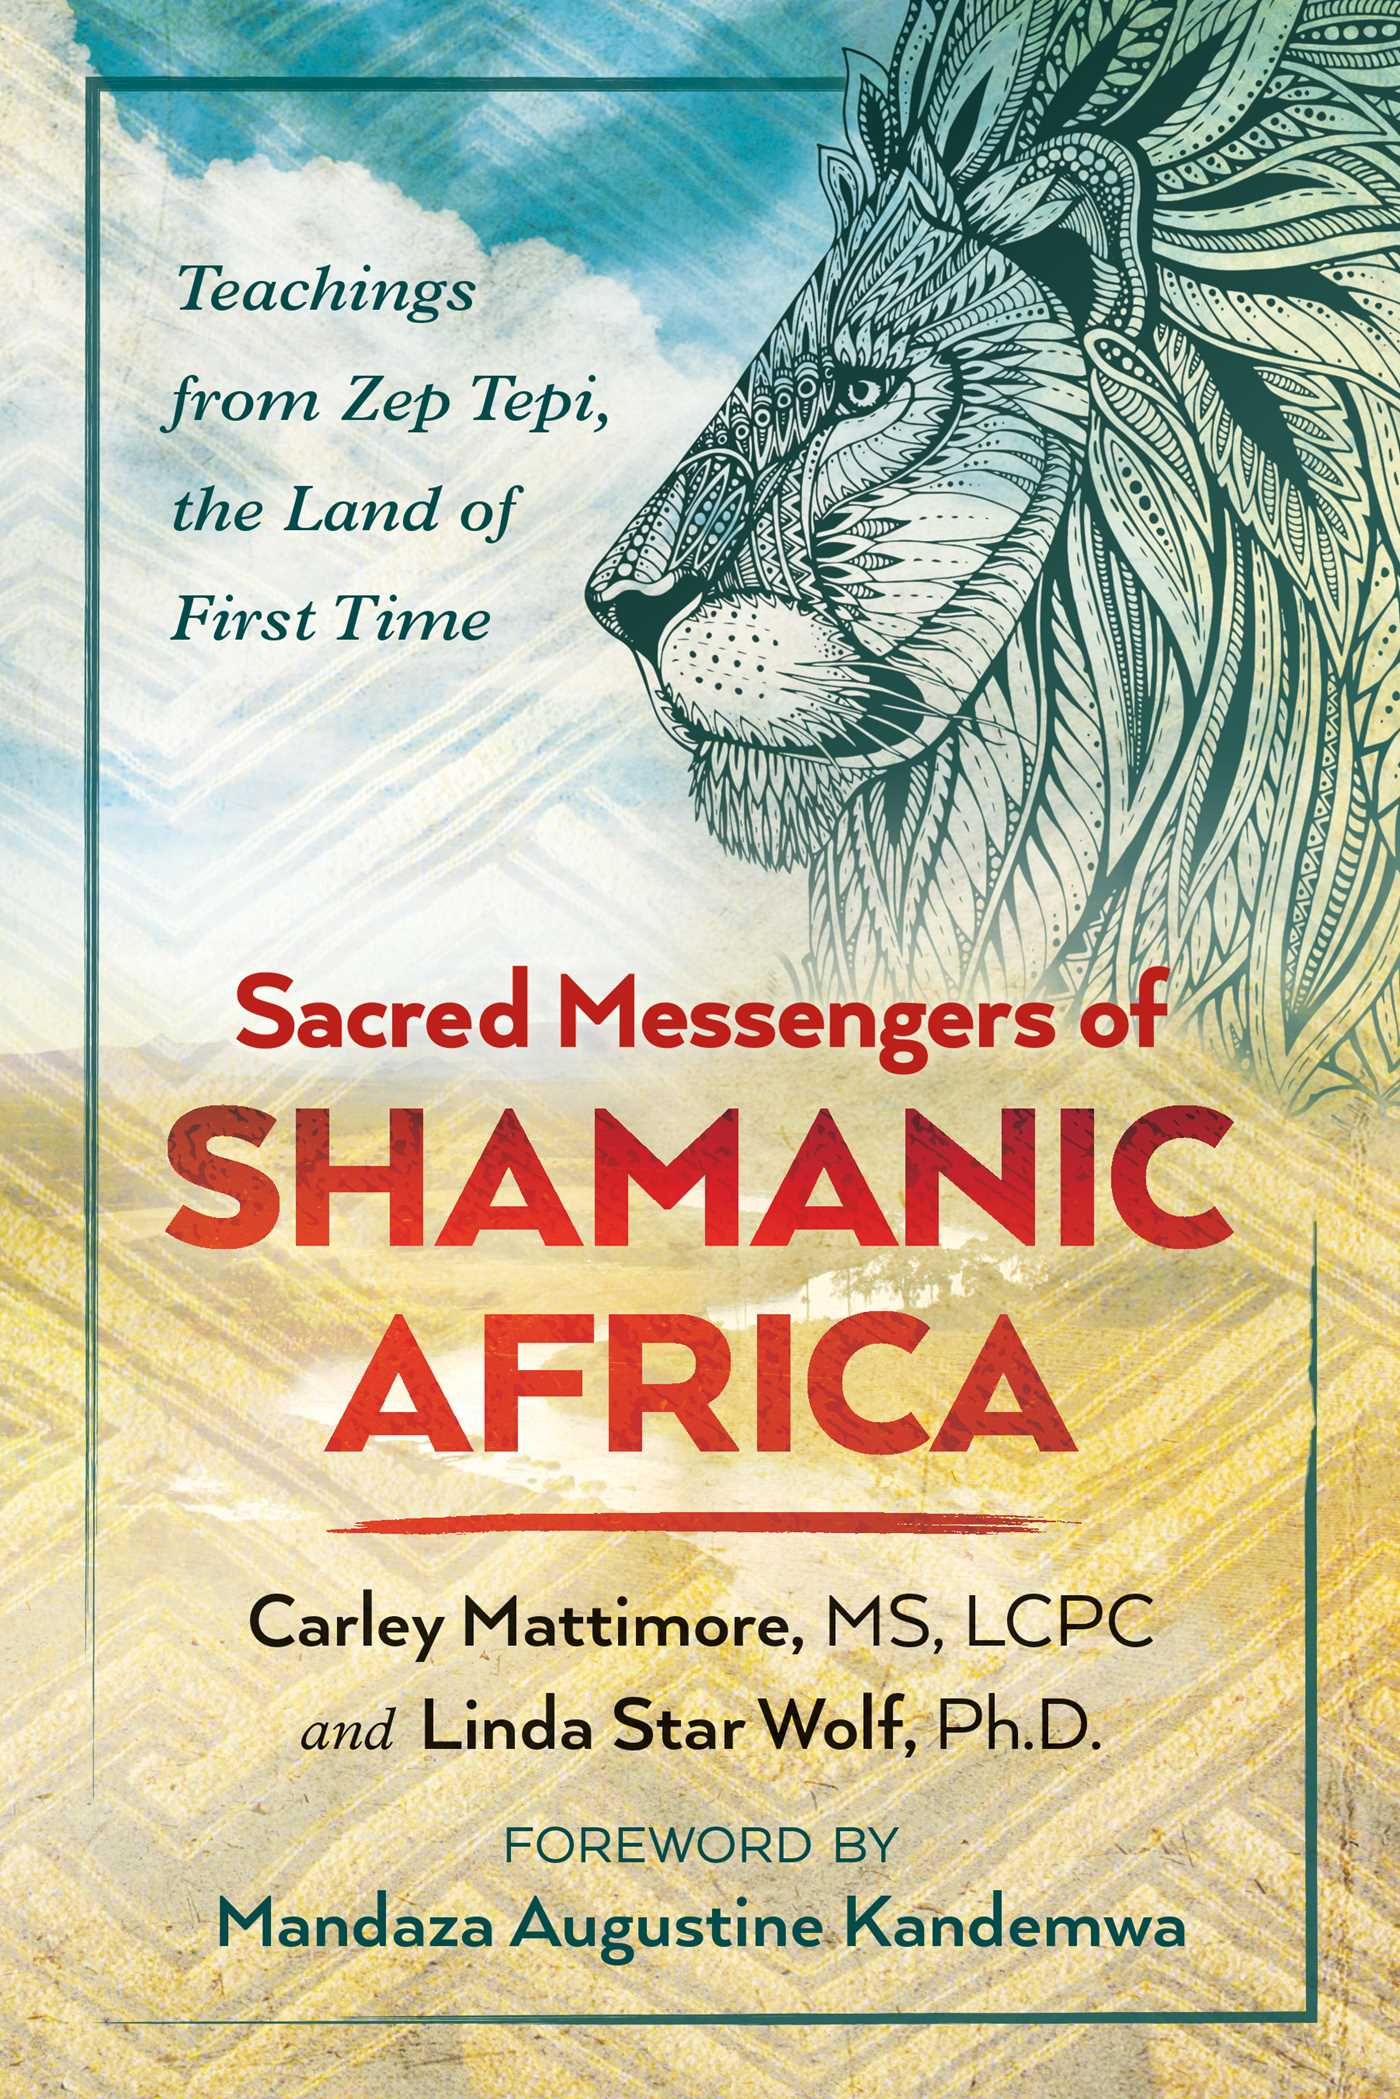 Sacred messengers of shamanic africa 9781591432913 hr